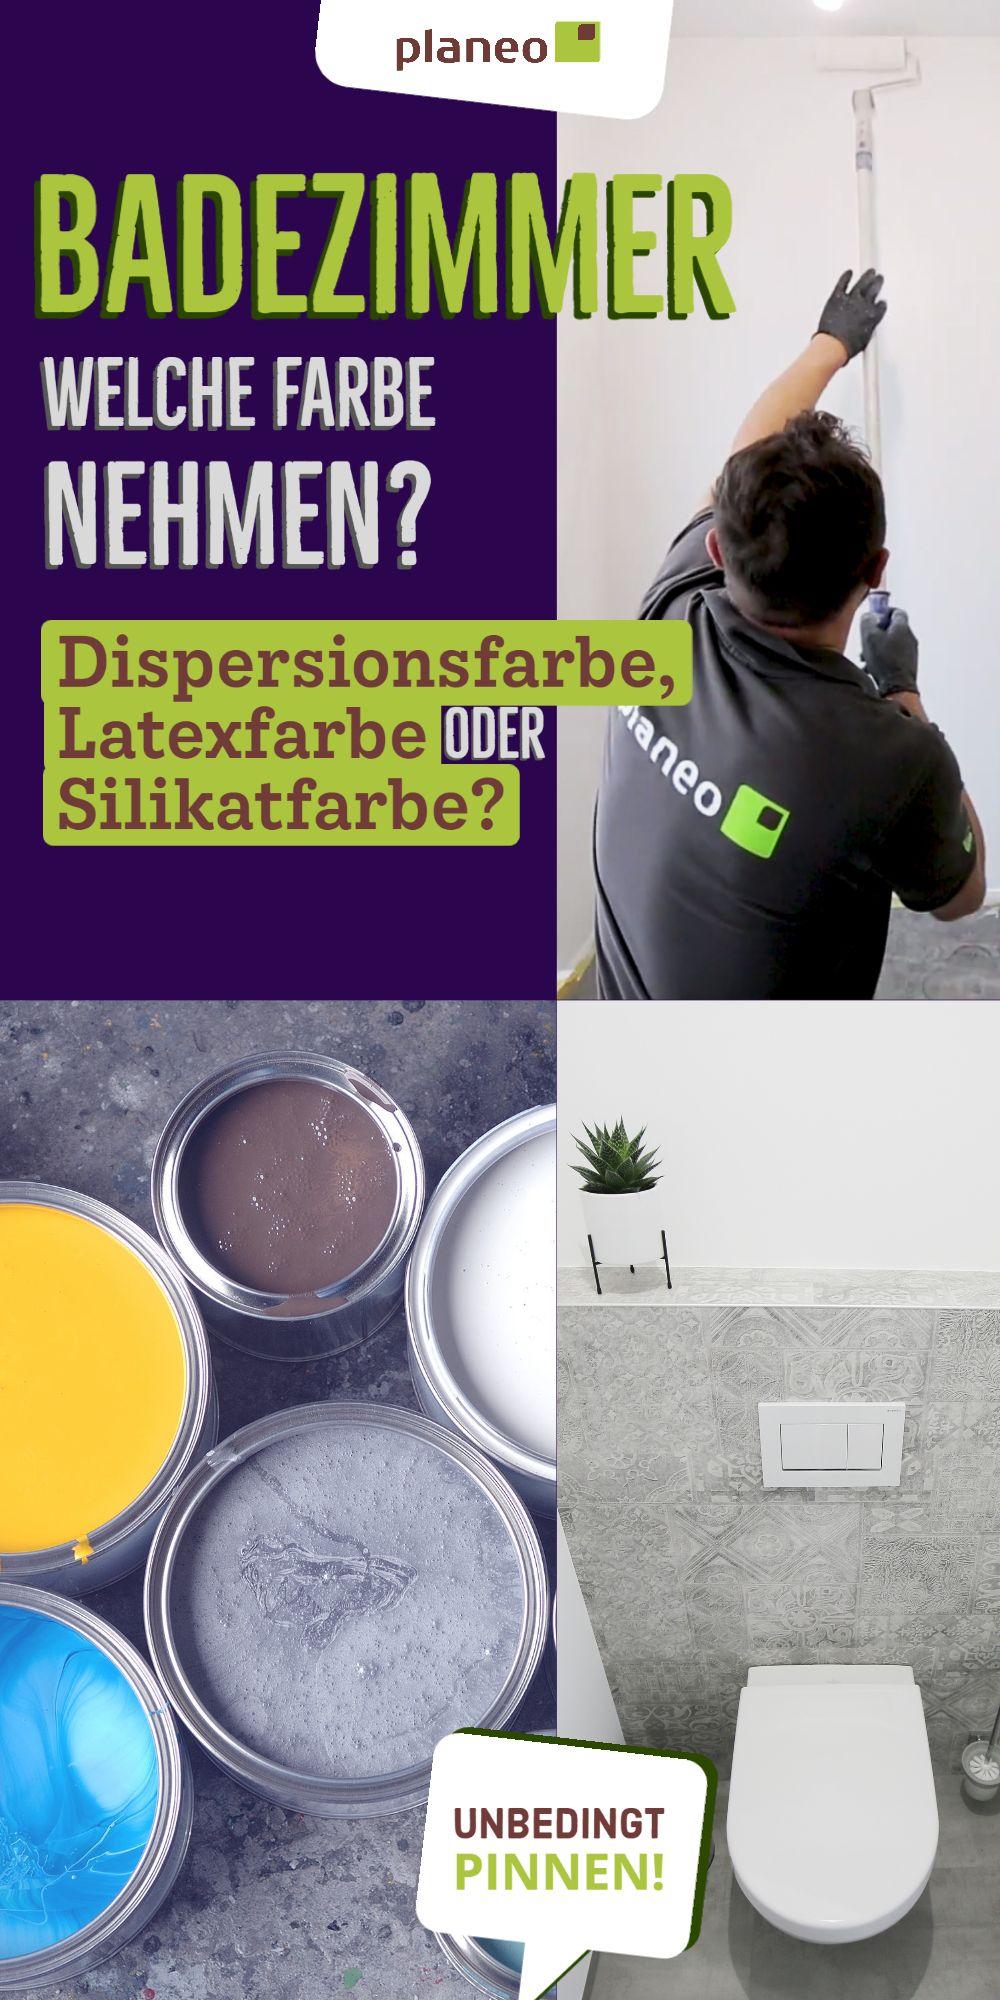 Badezimmer Streichen Welche Farbe Soll Man Nehmen Dispersionsfarbe Latexfarbe Silikatfarbe In 2020 Latexfarbe Badezimmer Streichen Dispersionsfarbe